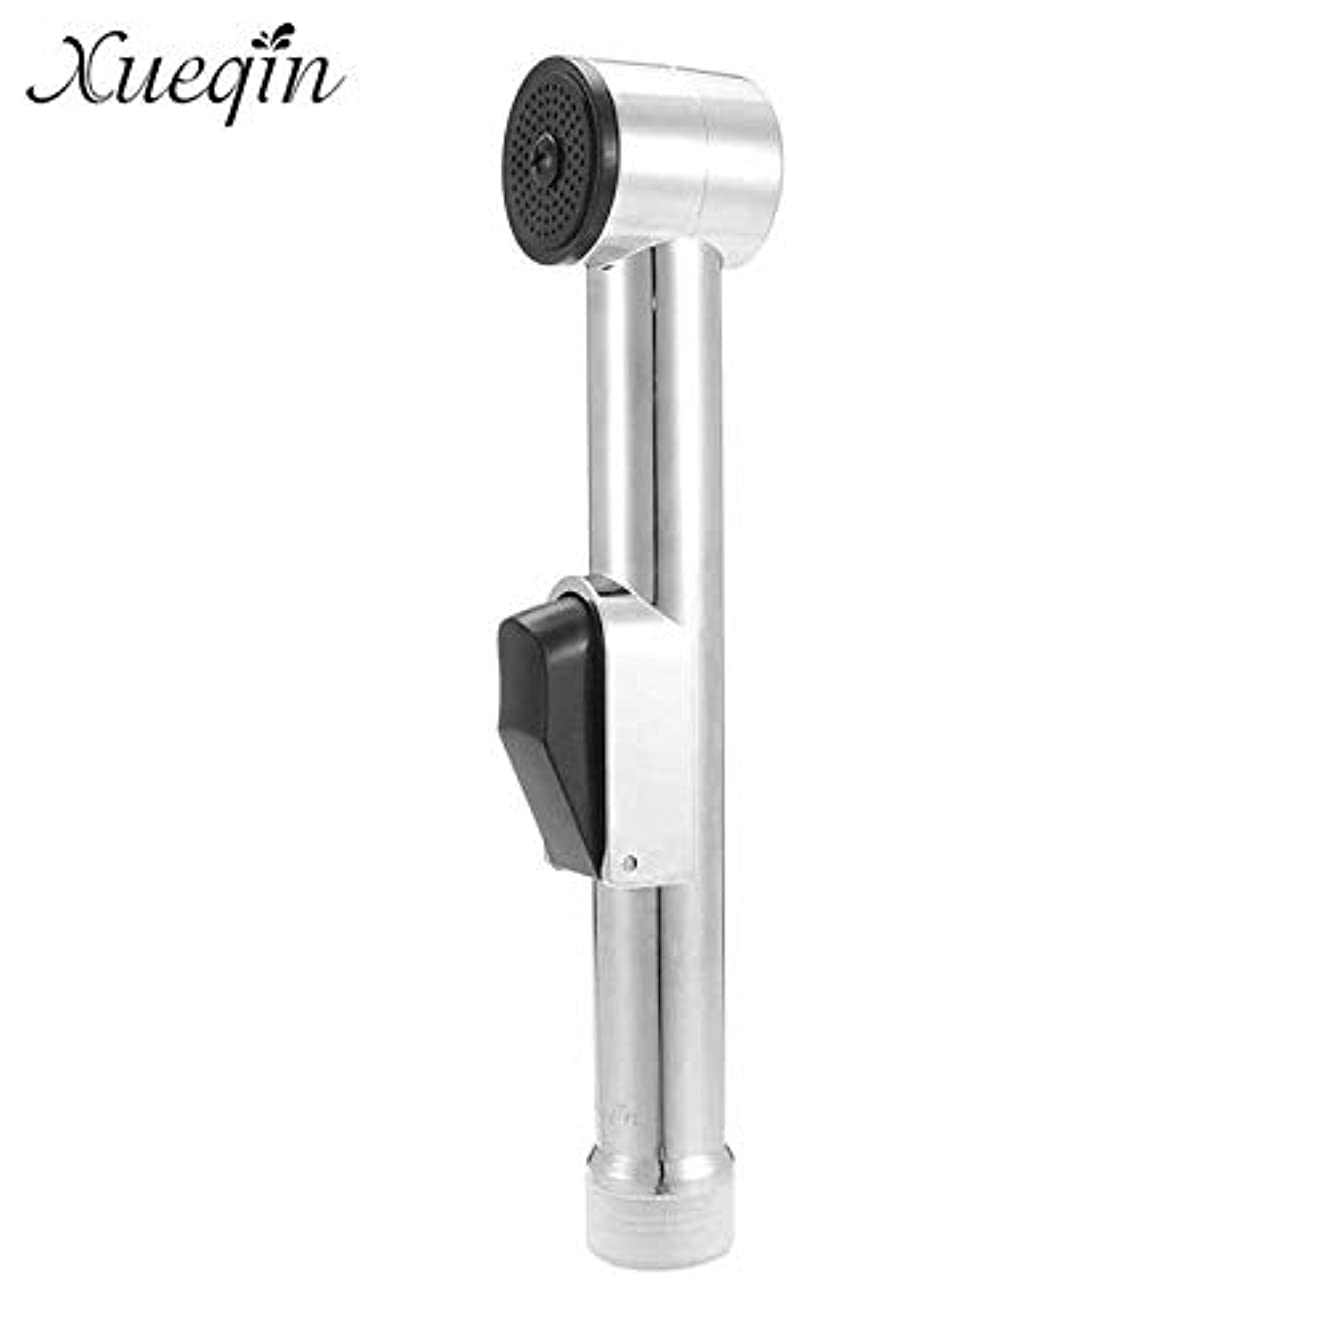 Showerhead Handheld Toilet Bathroom Toilet Shower Head Nozzle